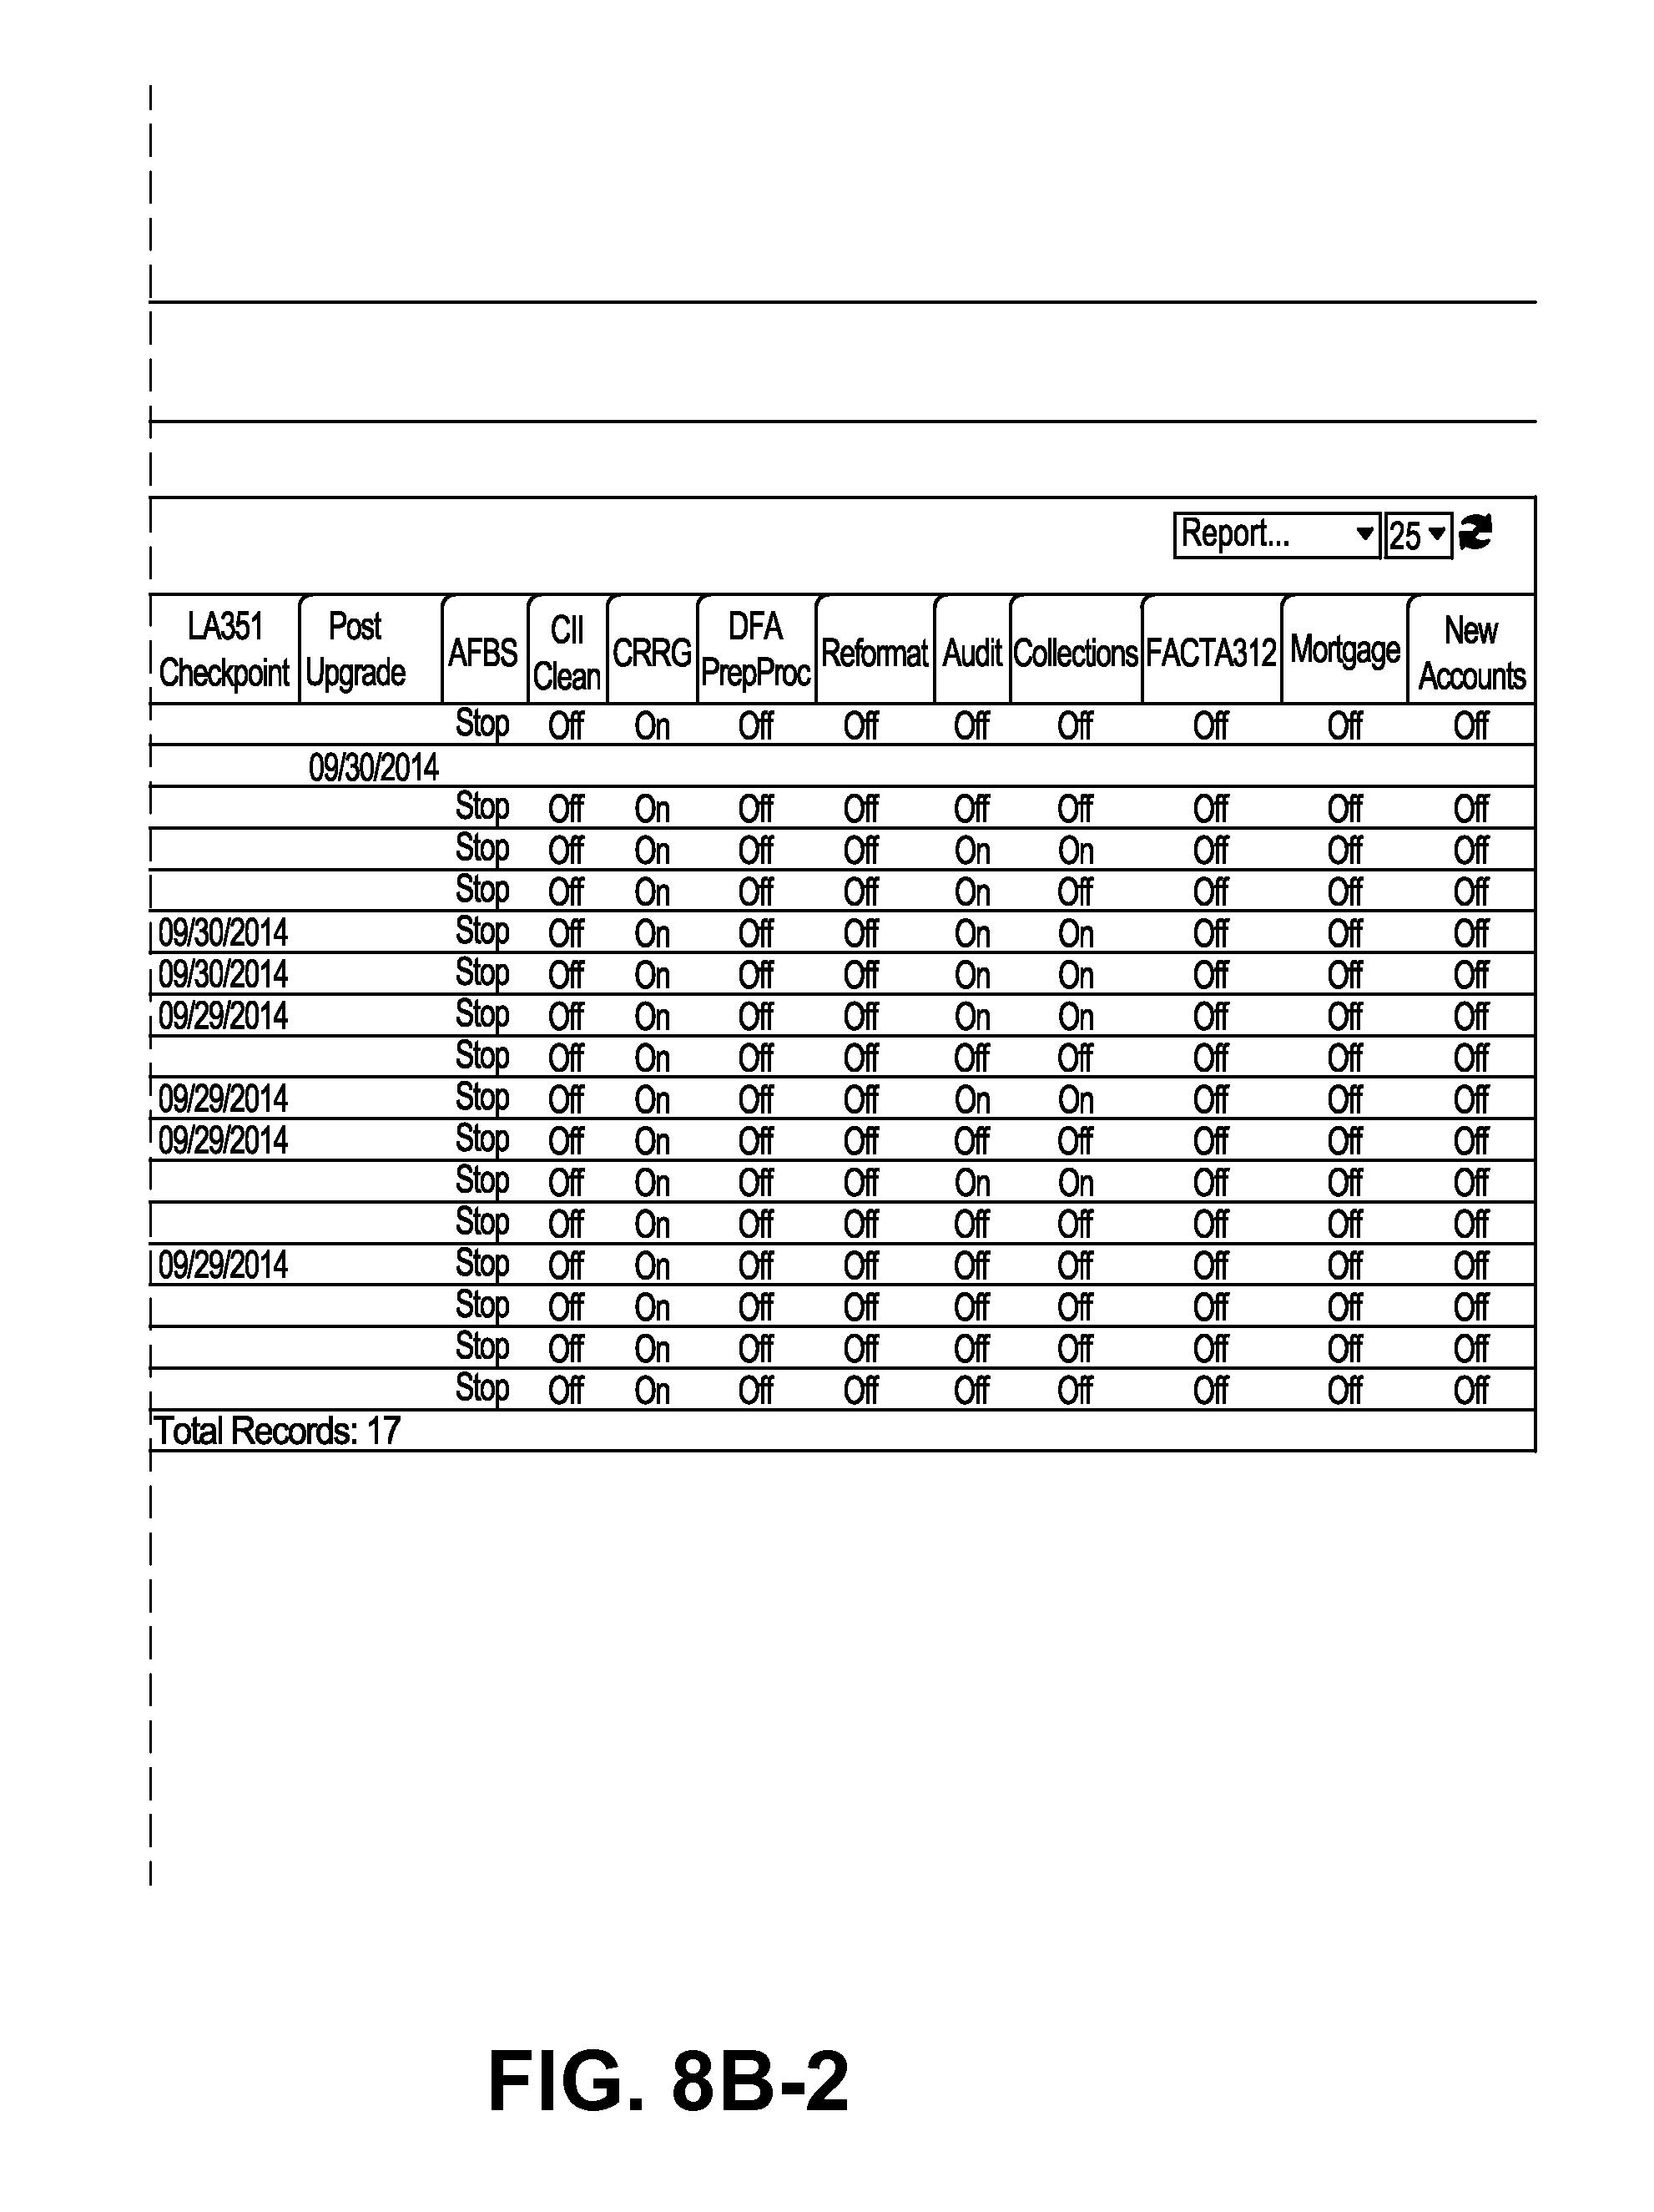 blackberry backup extractor 2040 registration key